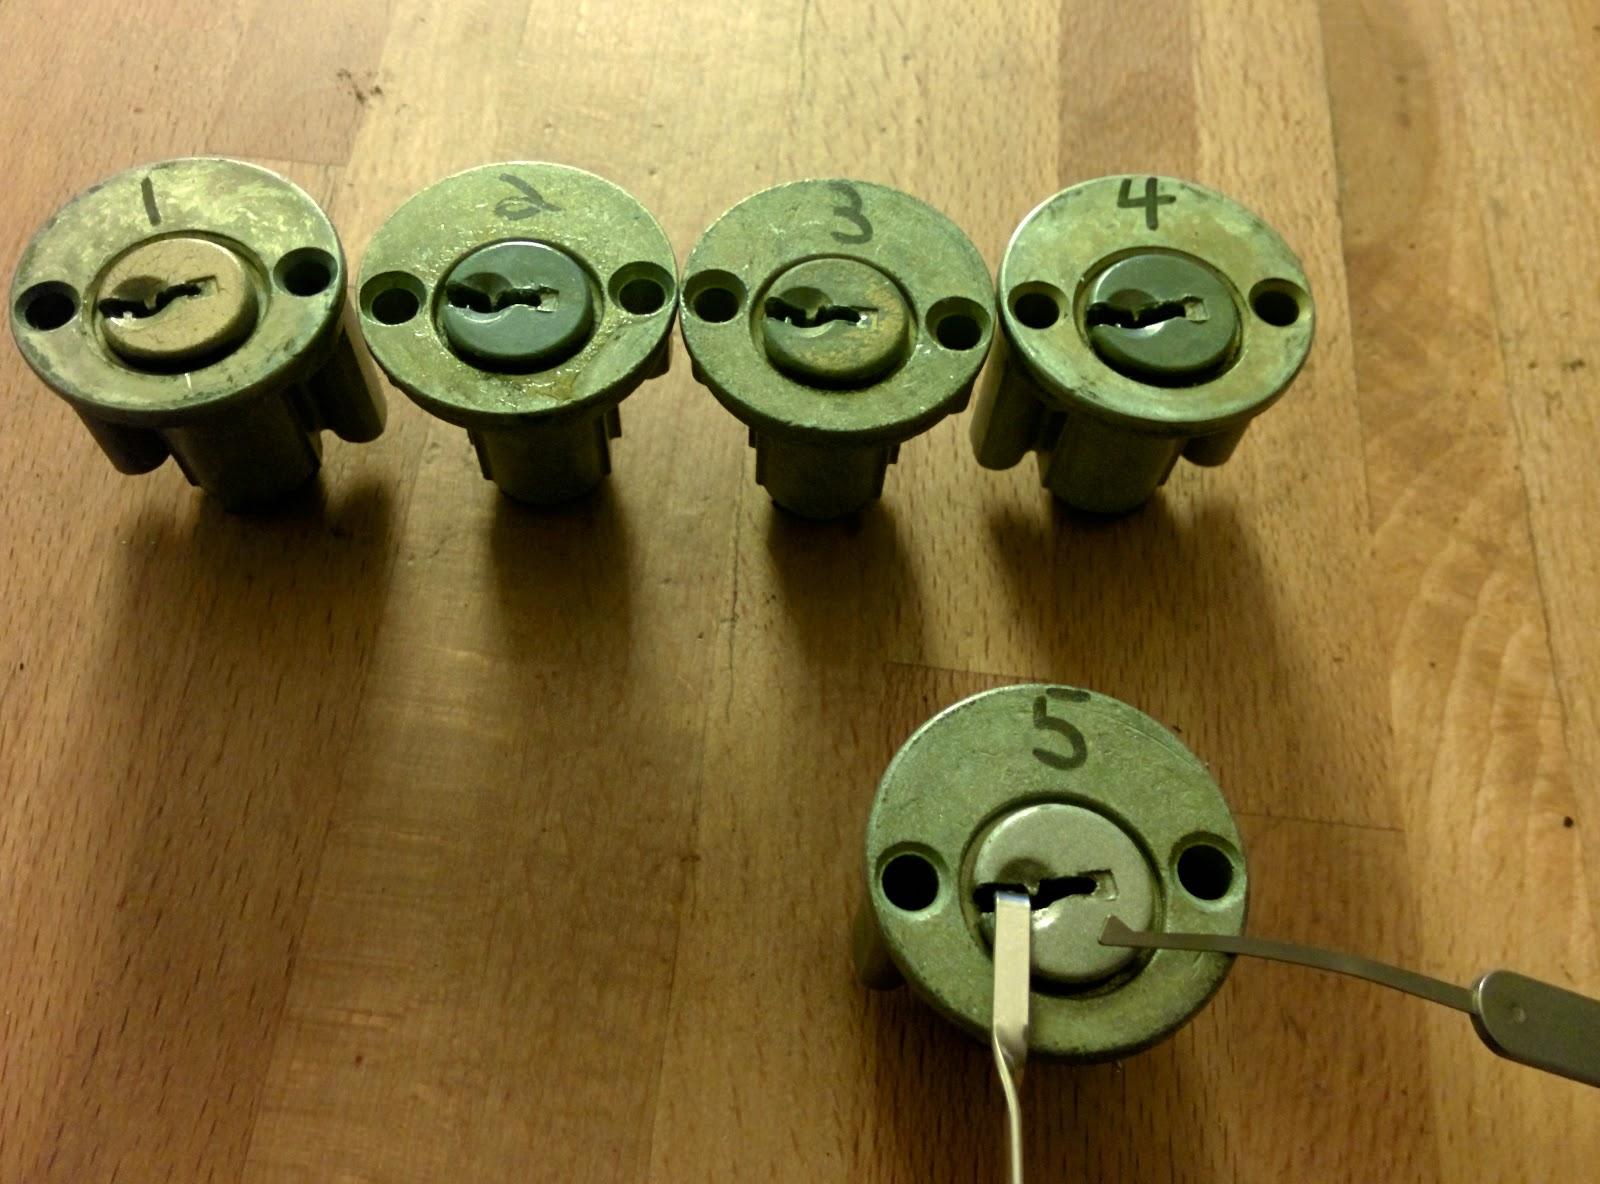 Lock Picking 101: Build a Set of Progressive Locks